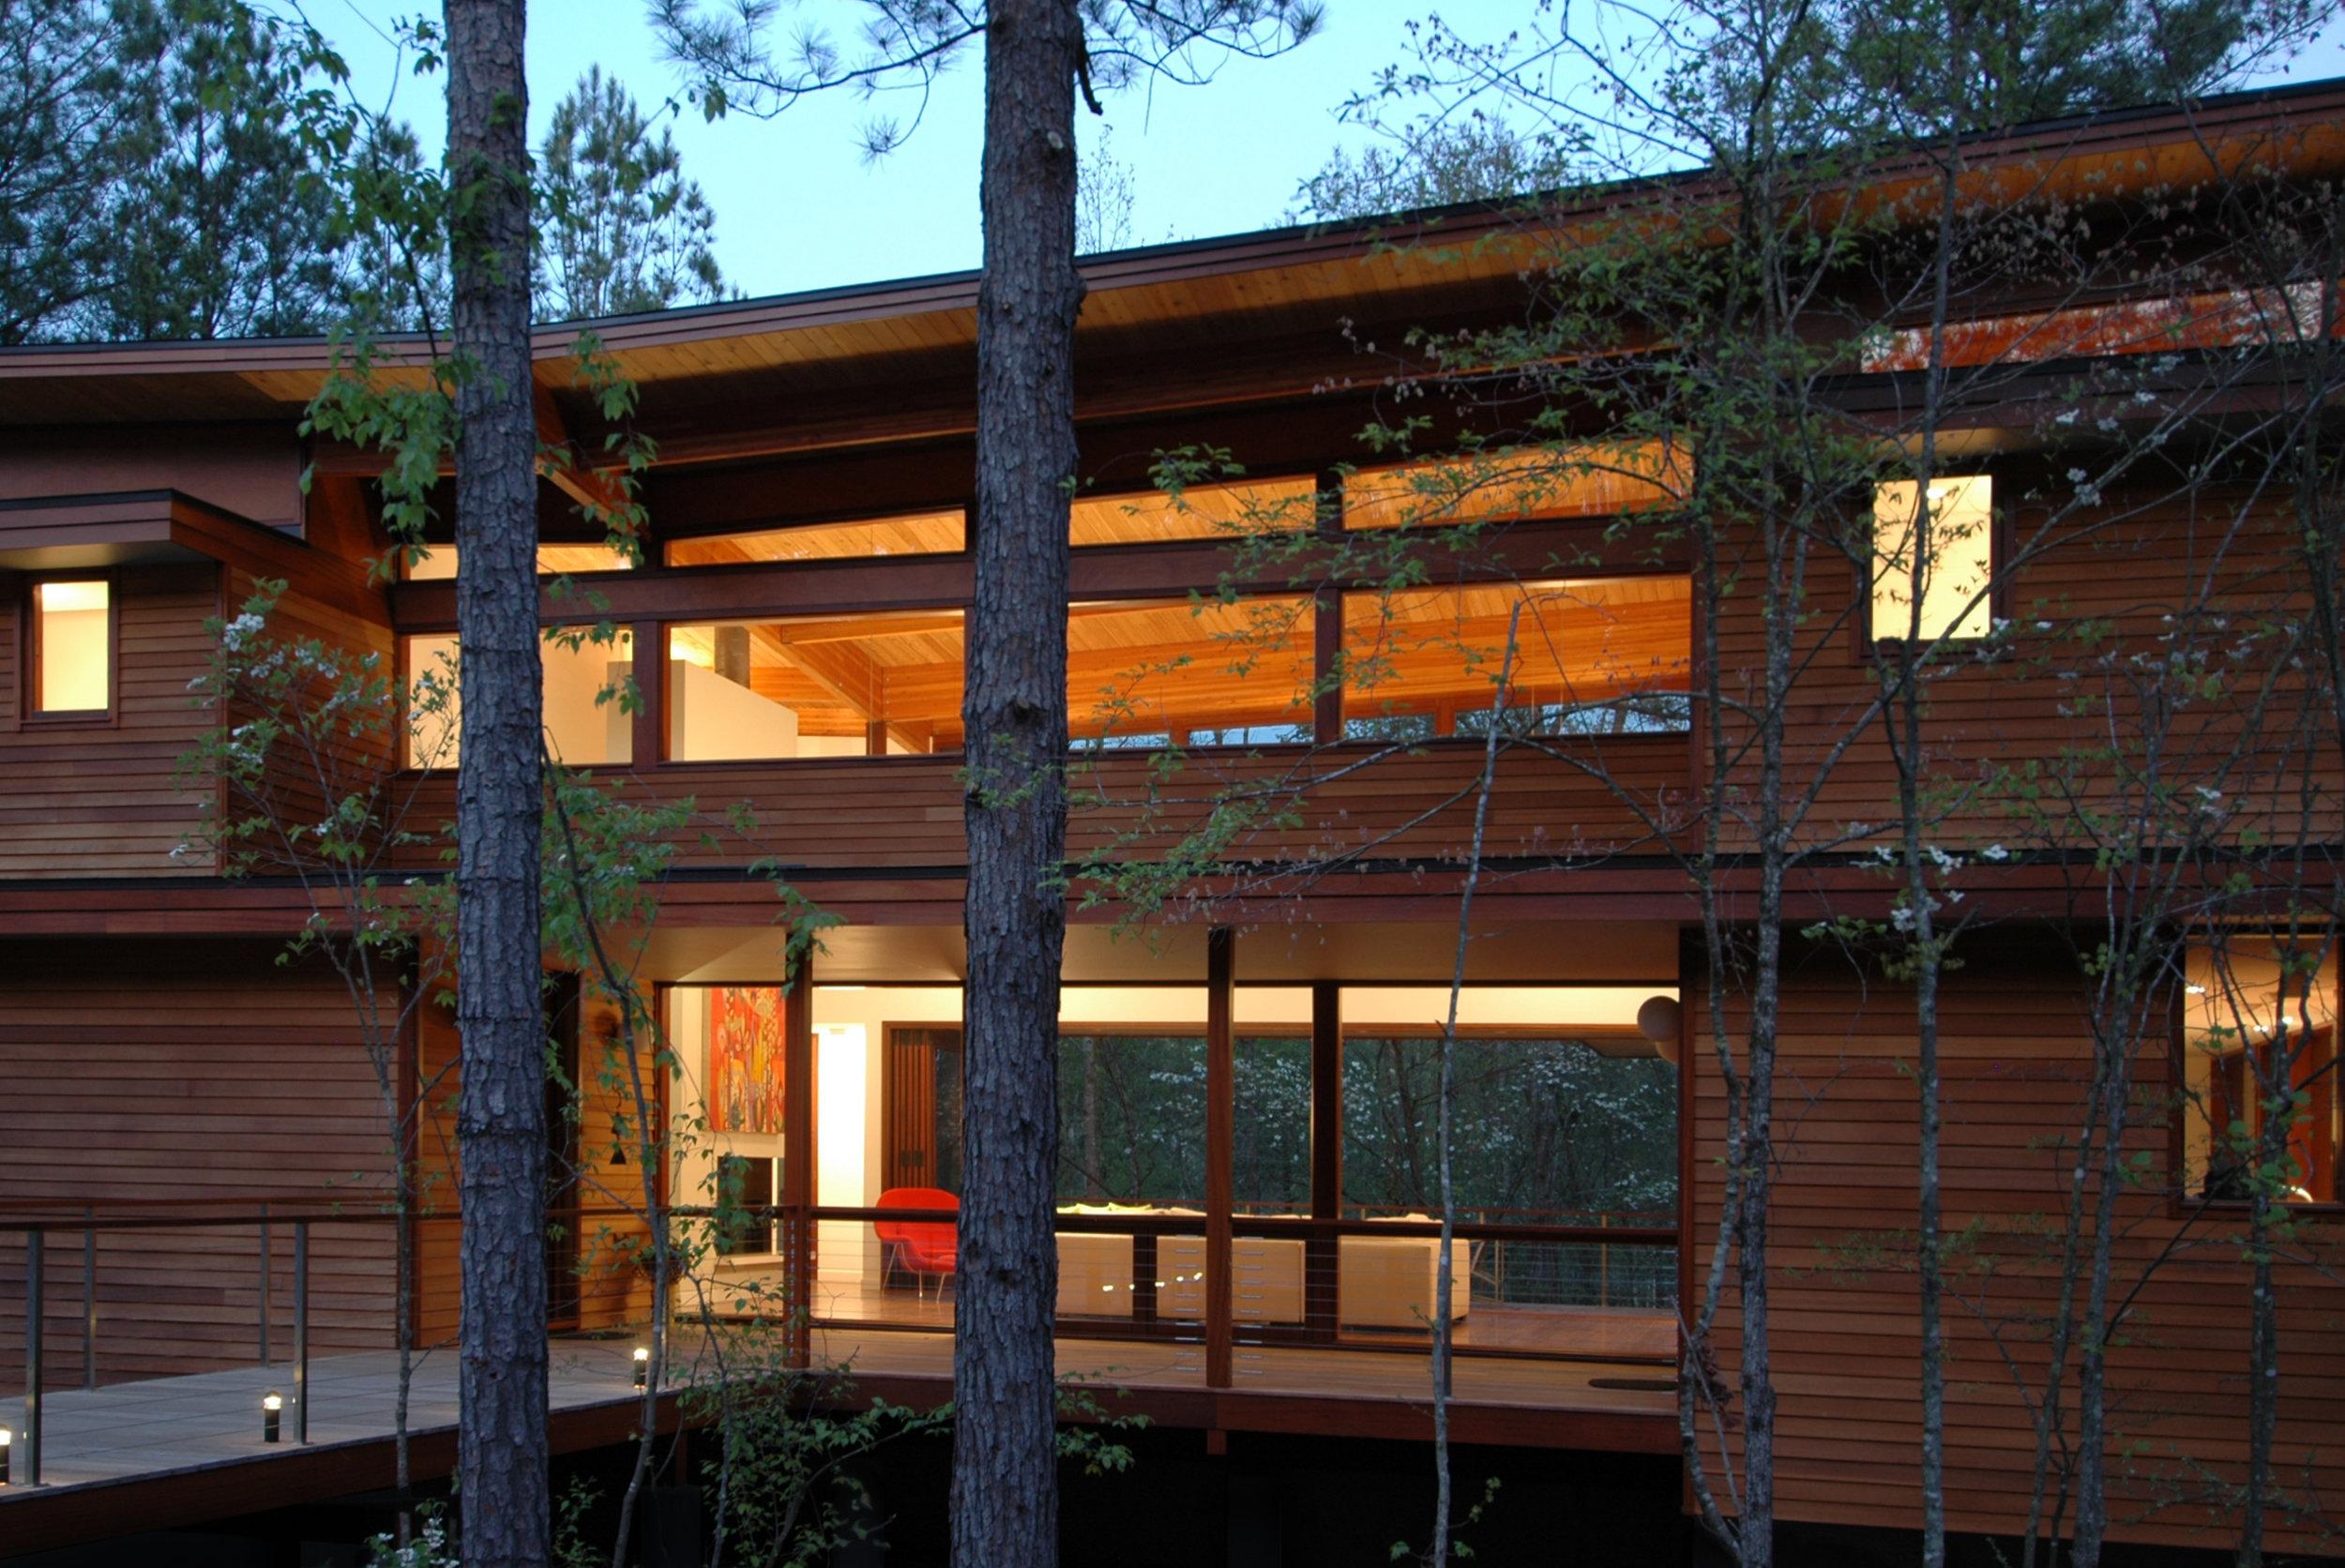 Atlanta, Georgia - Serenbe House